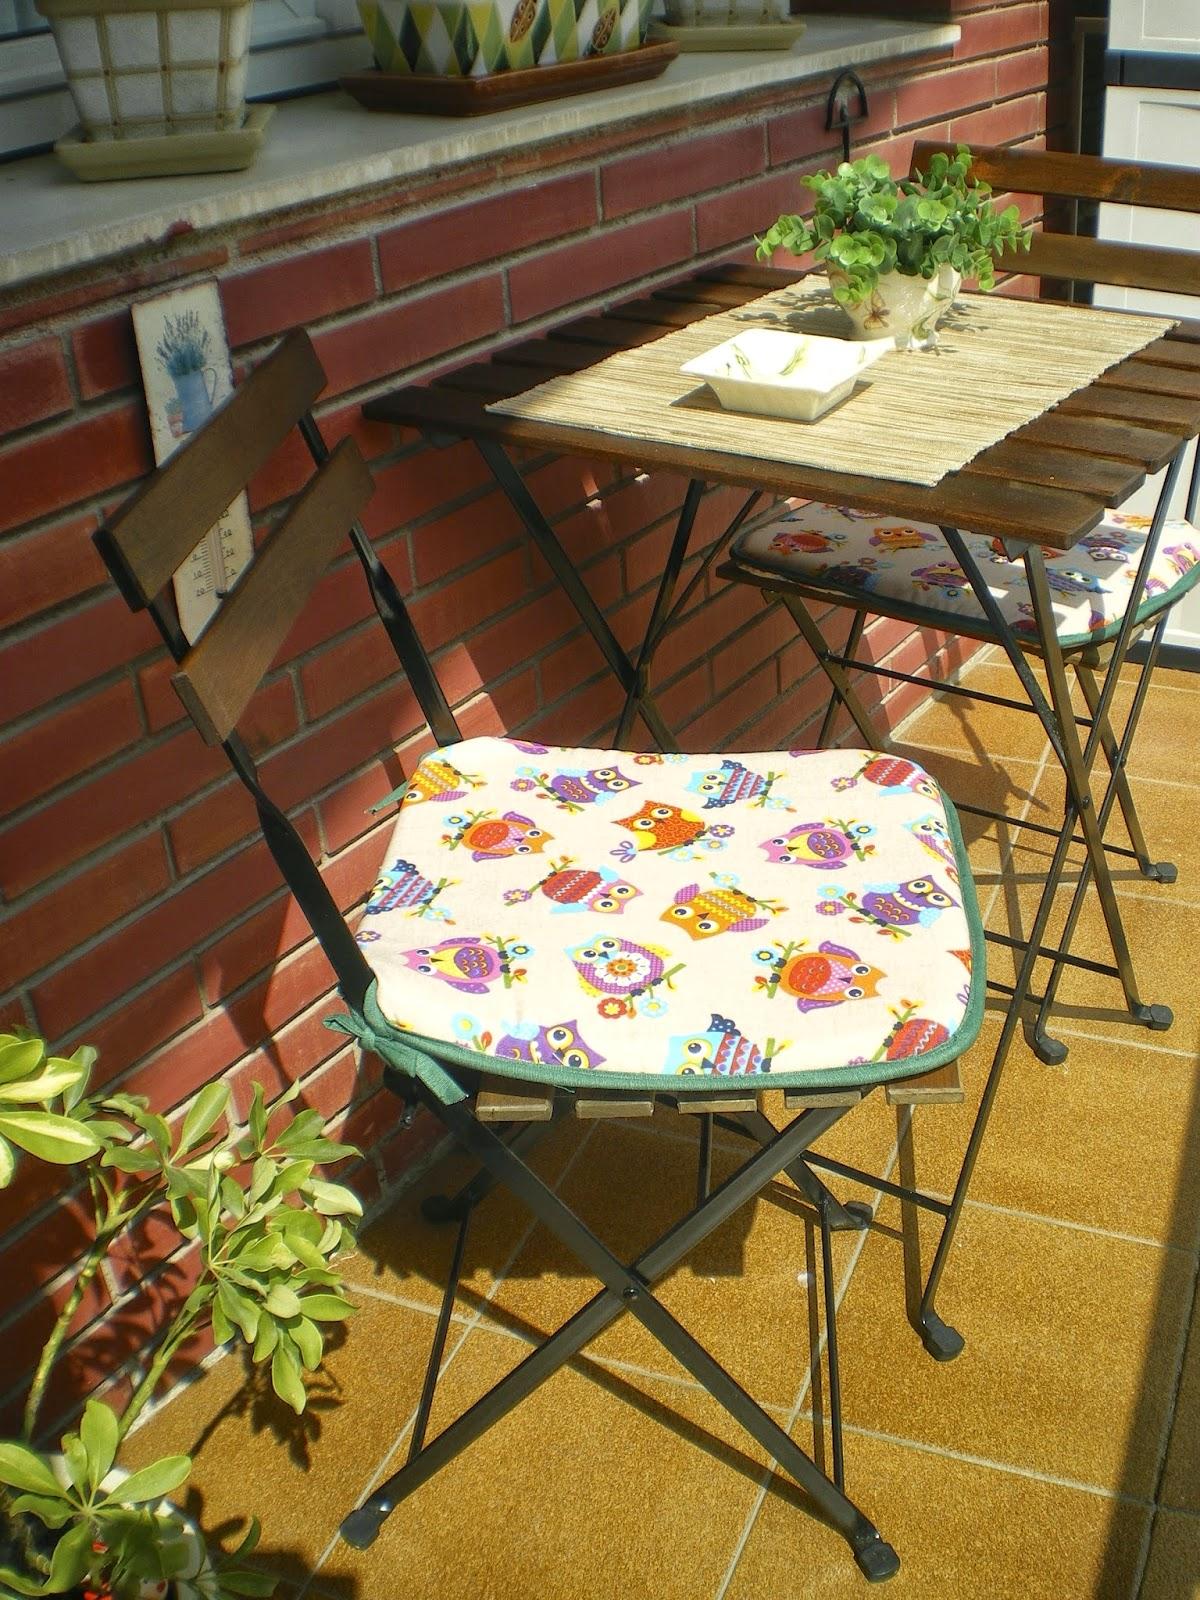 Cojines sillas terraza dise os arquitect nicos - Cojines para sillas ...